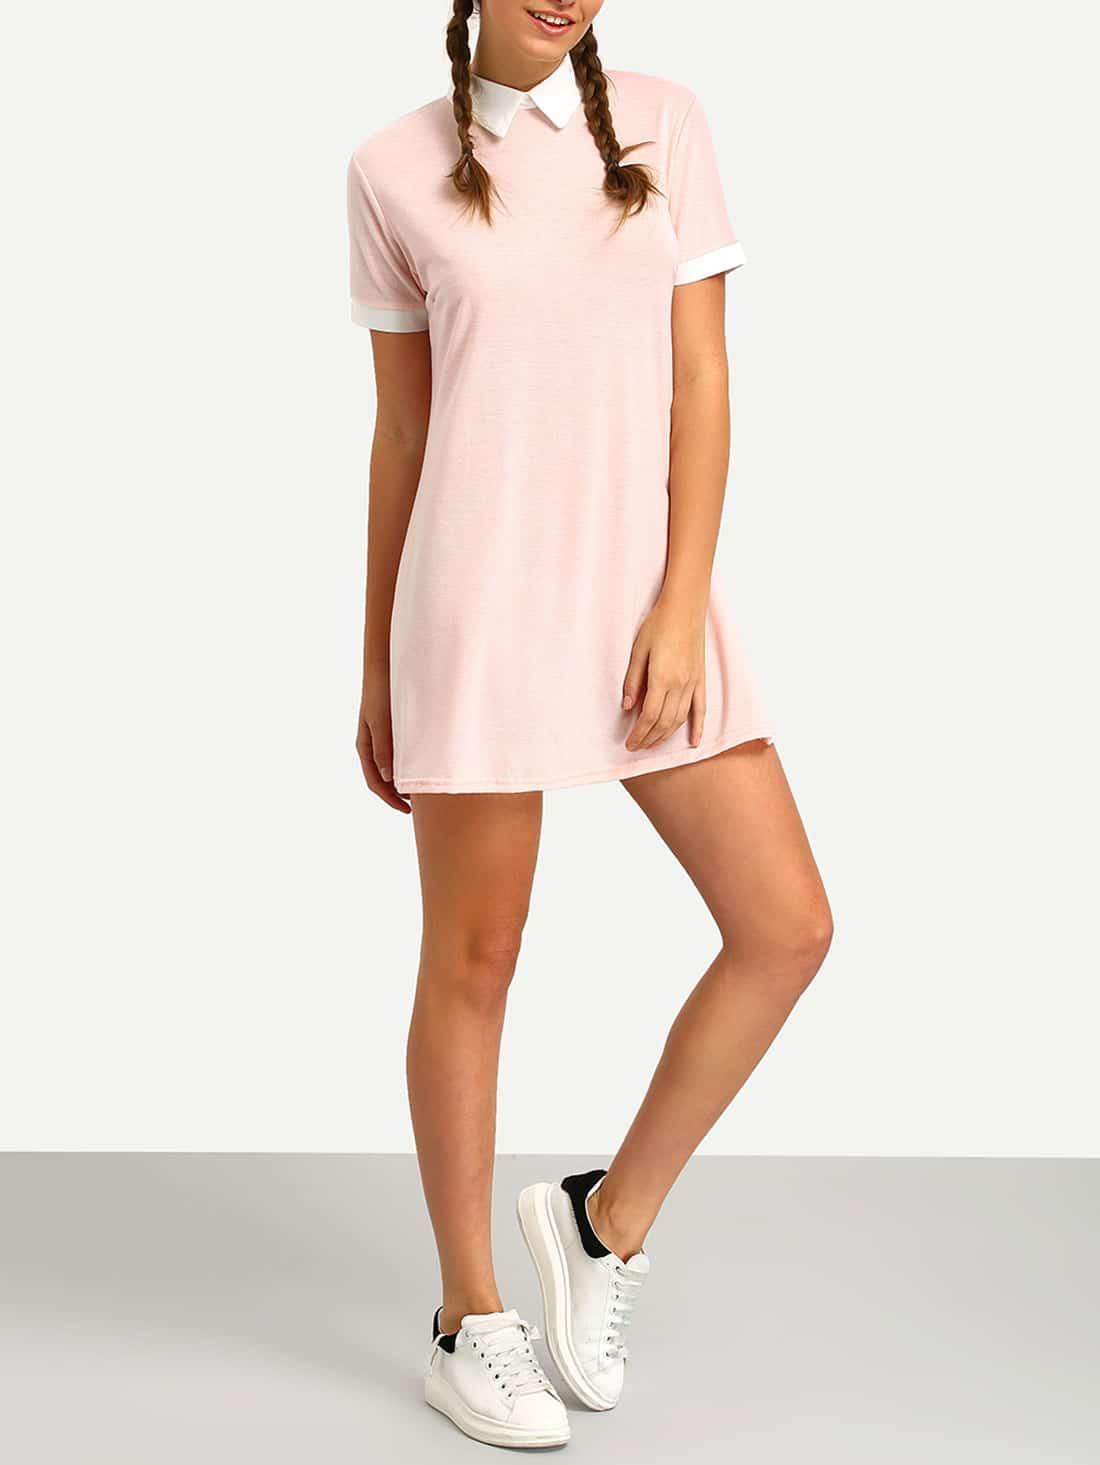 Pink Contrast Collar Shirt DressFor Women-romwe